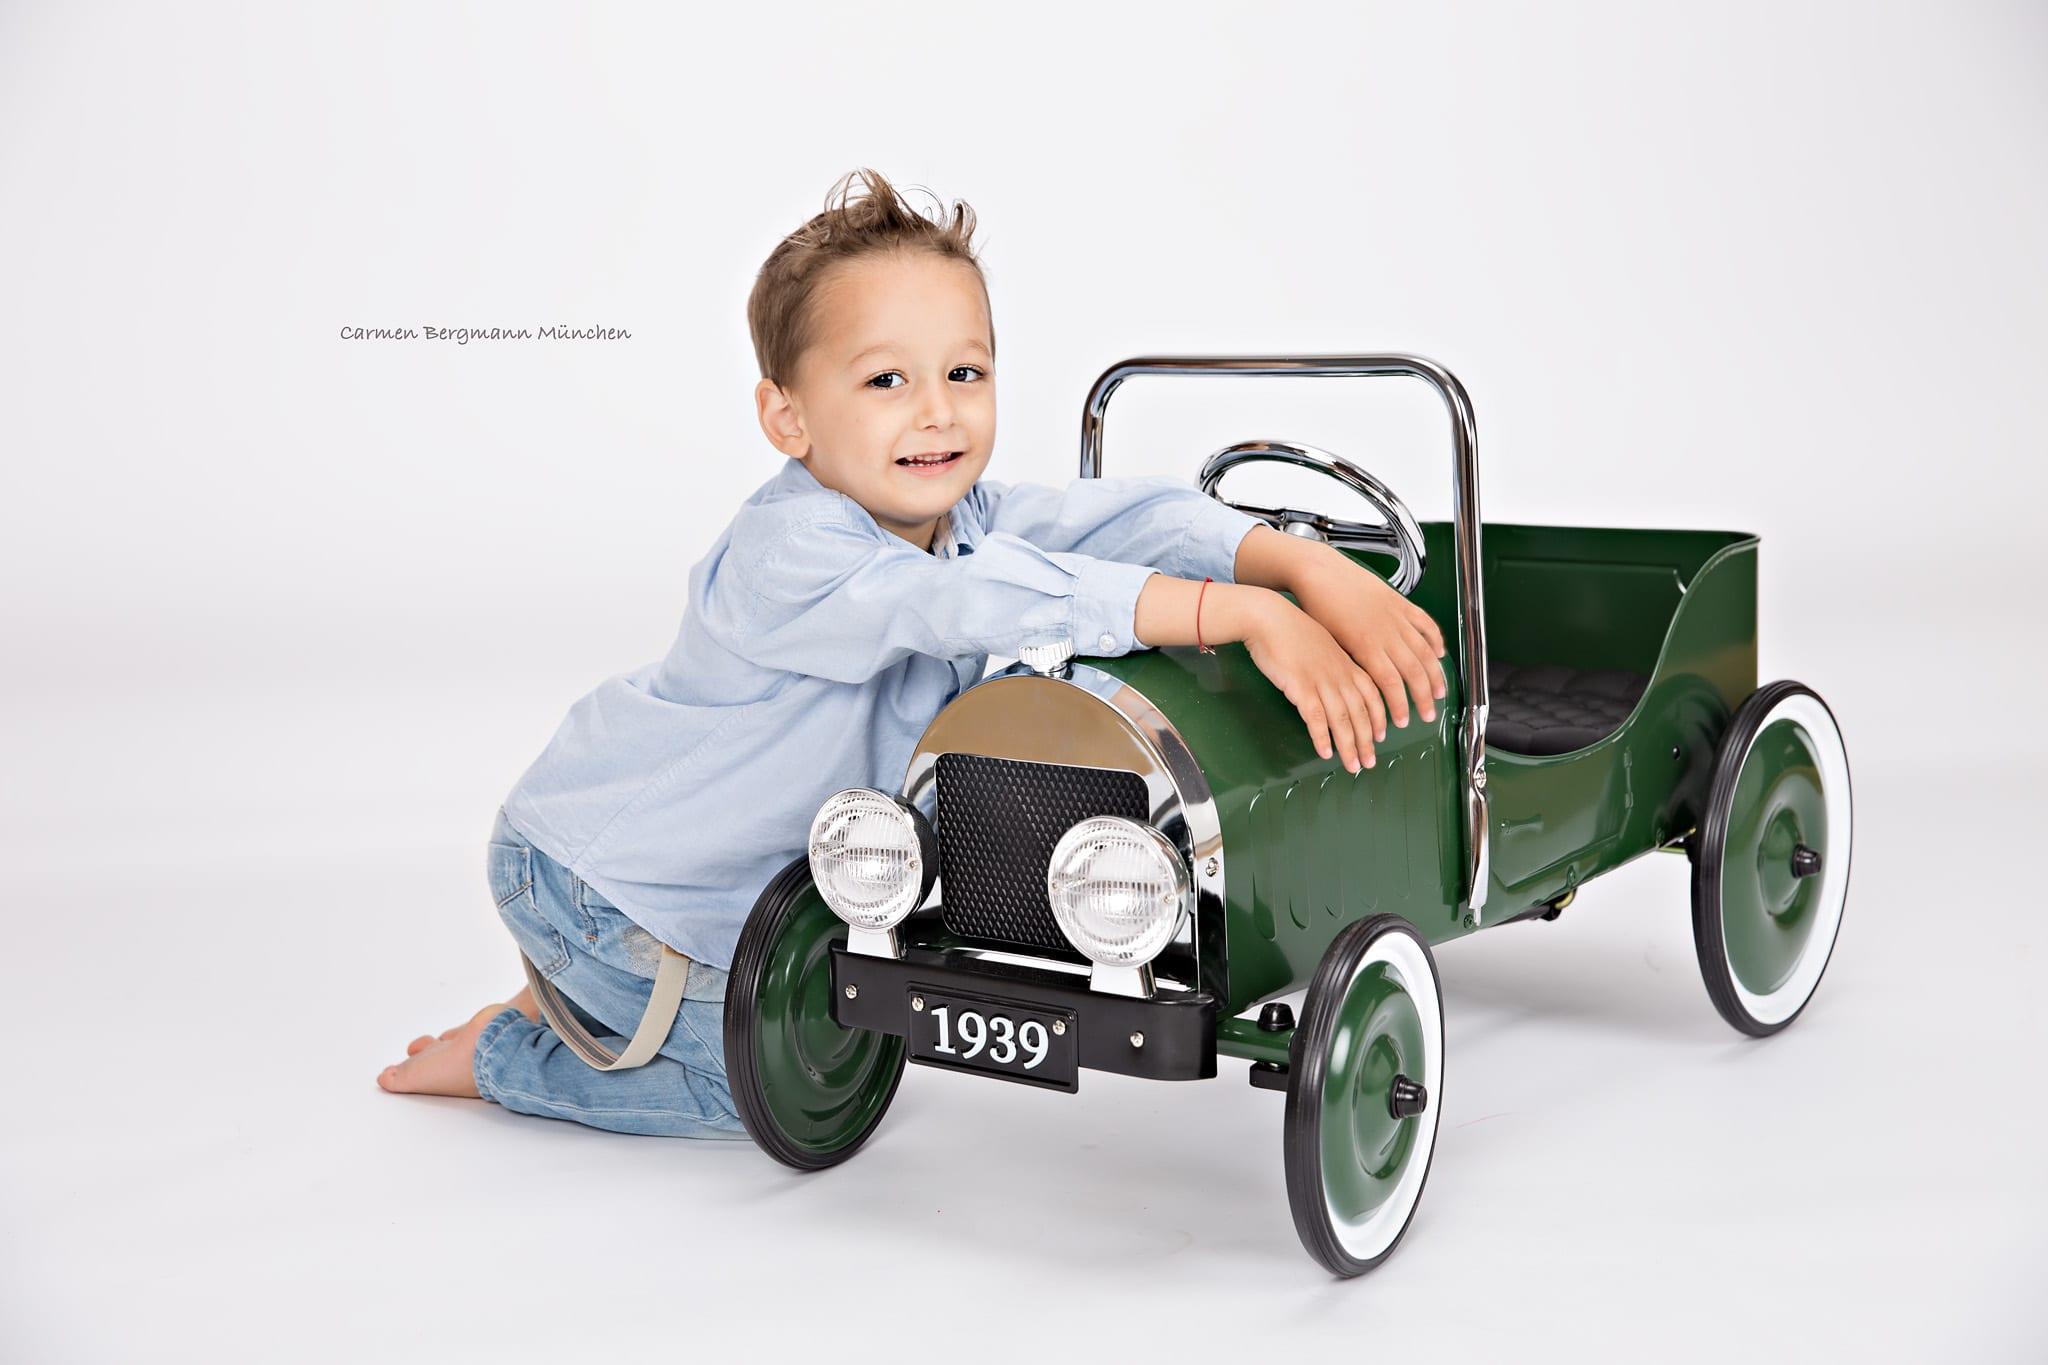 Kinder Fotografin Muenchen Carmen Bergmann Herzogstr.56 80803 Muenchen 089 / 21 54 35 94